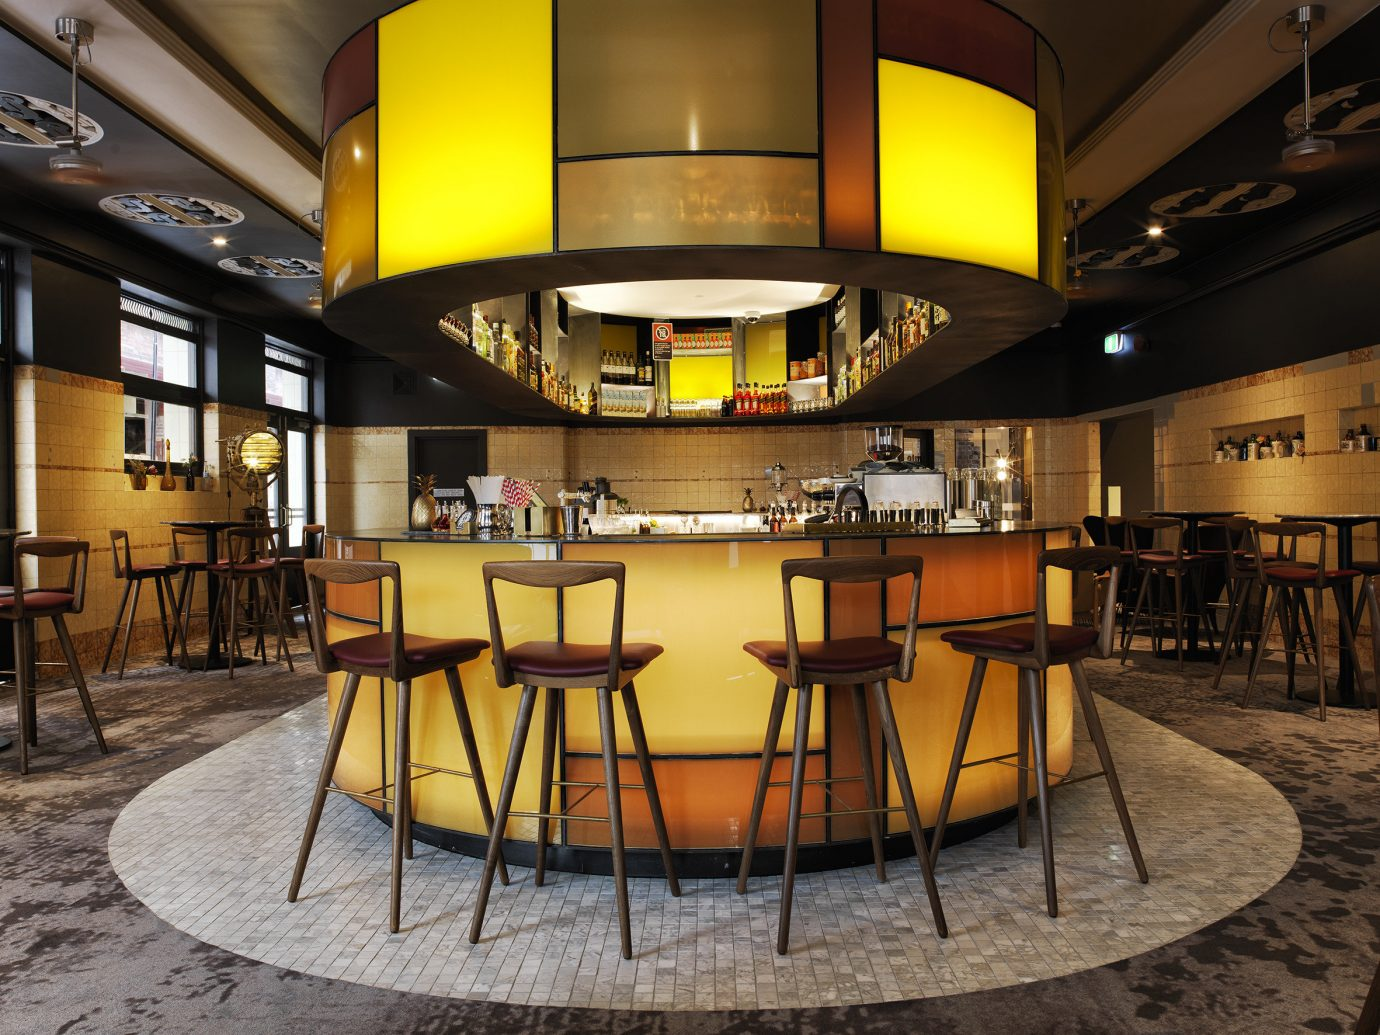 Trip Ideas chair yellow indoor man made object Lobby ceiling interior design lighting Dining Bar restaurant estate Design area